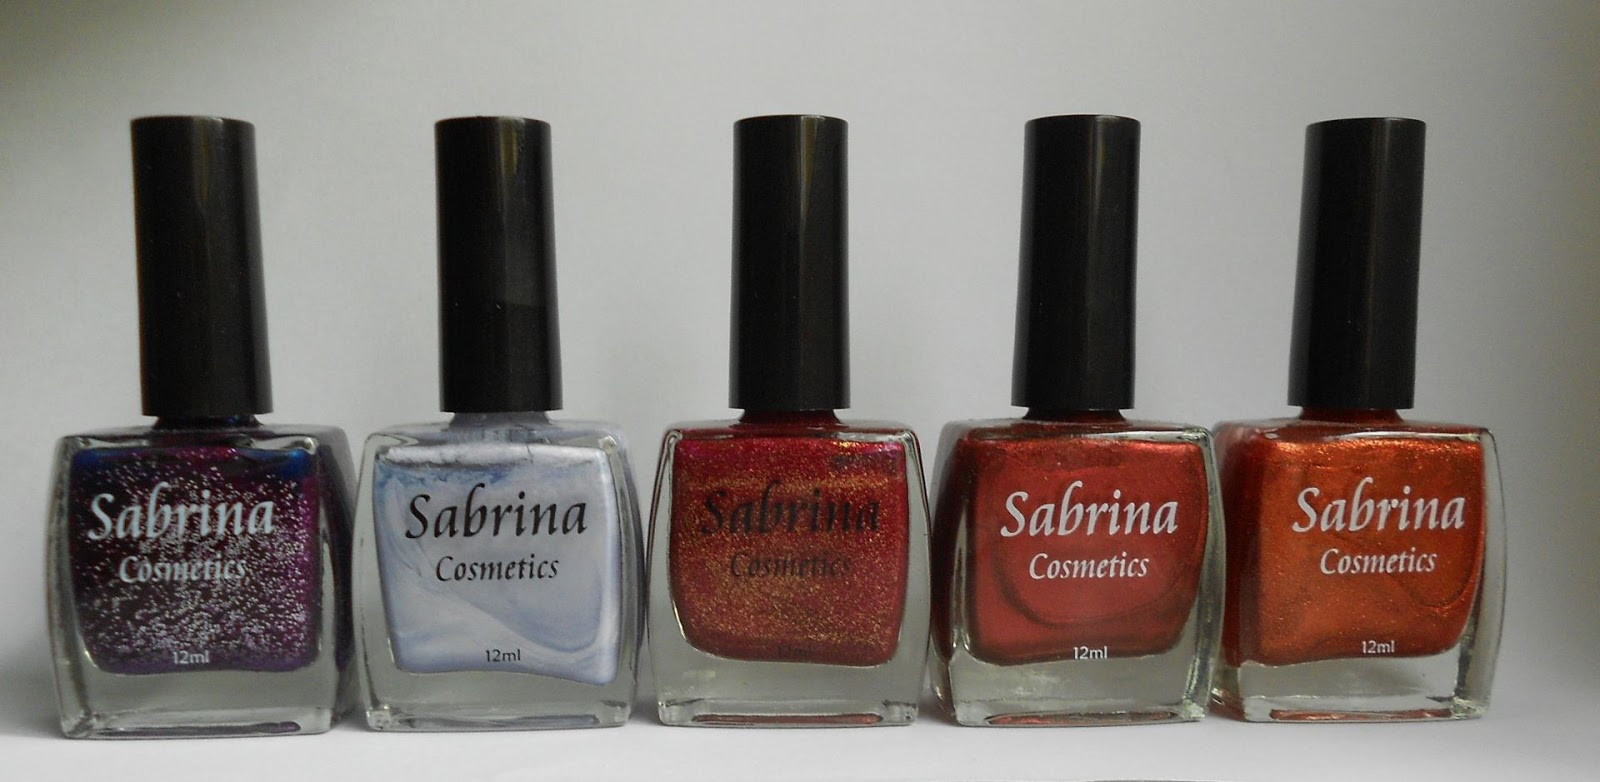 Nagellacke Sabrina Cosmetics